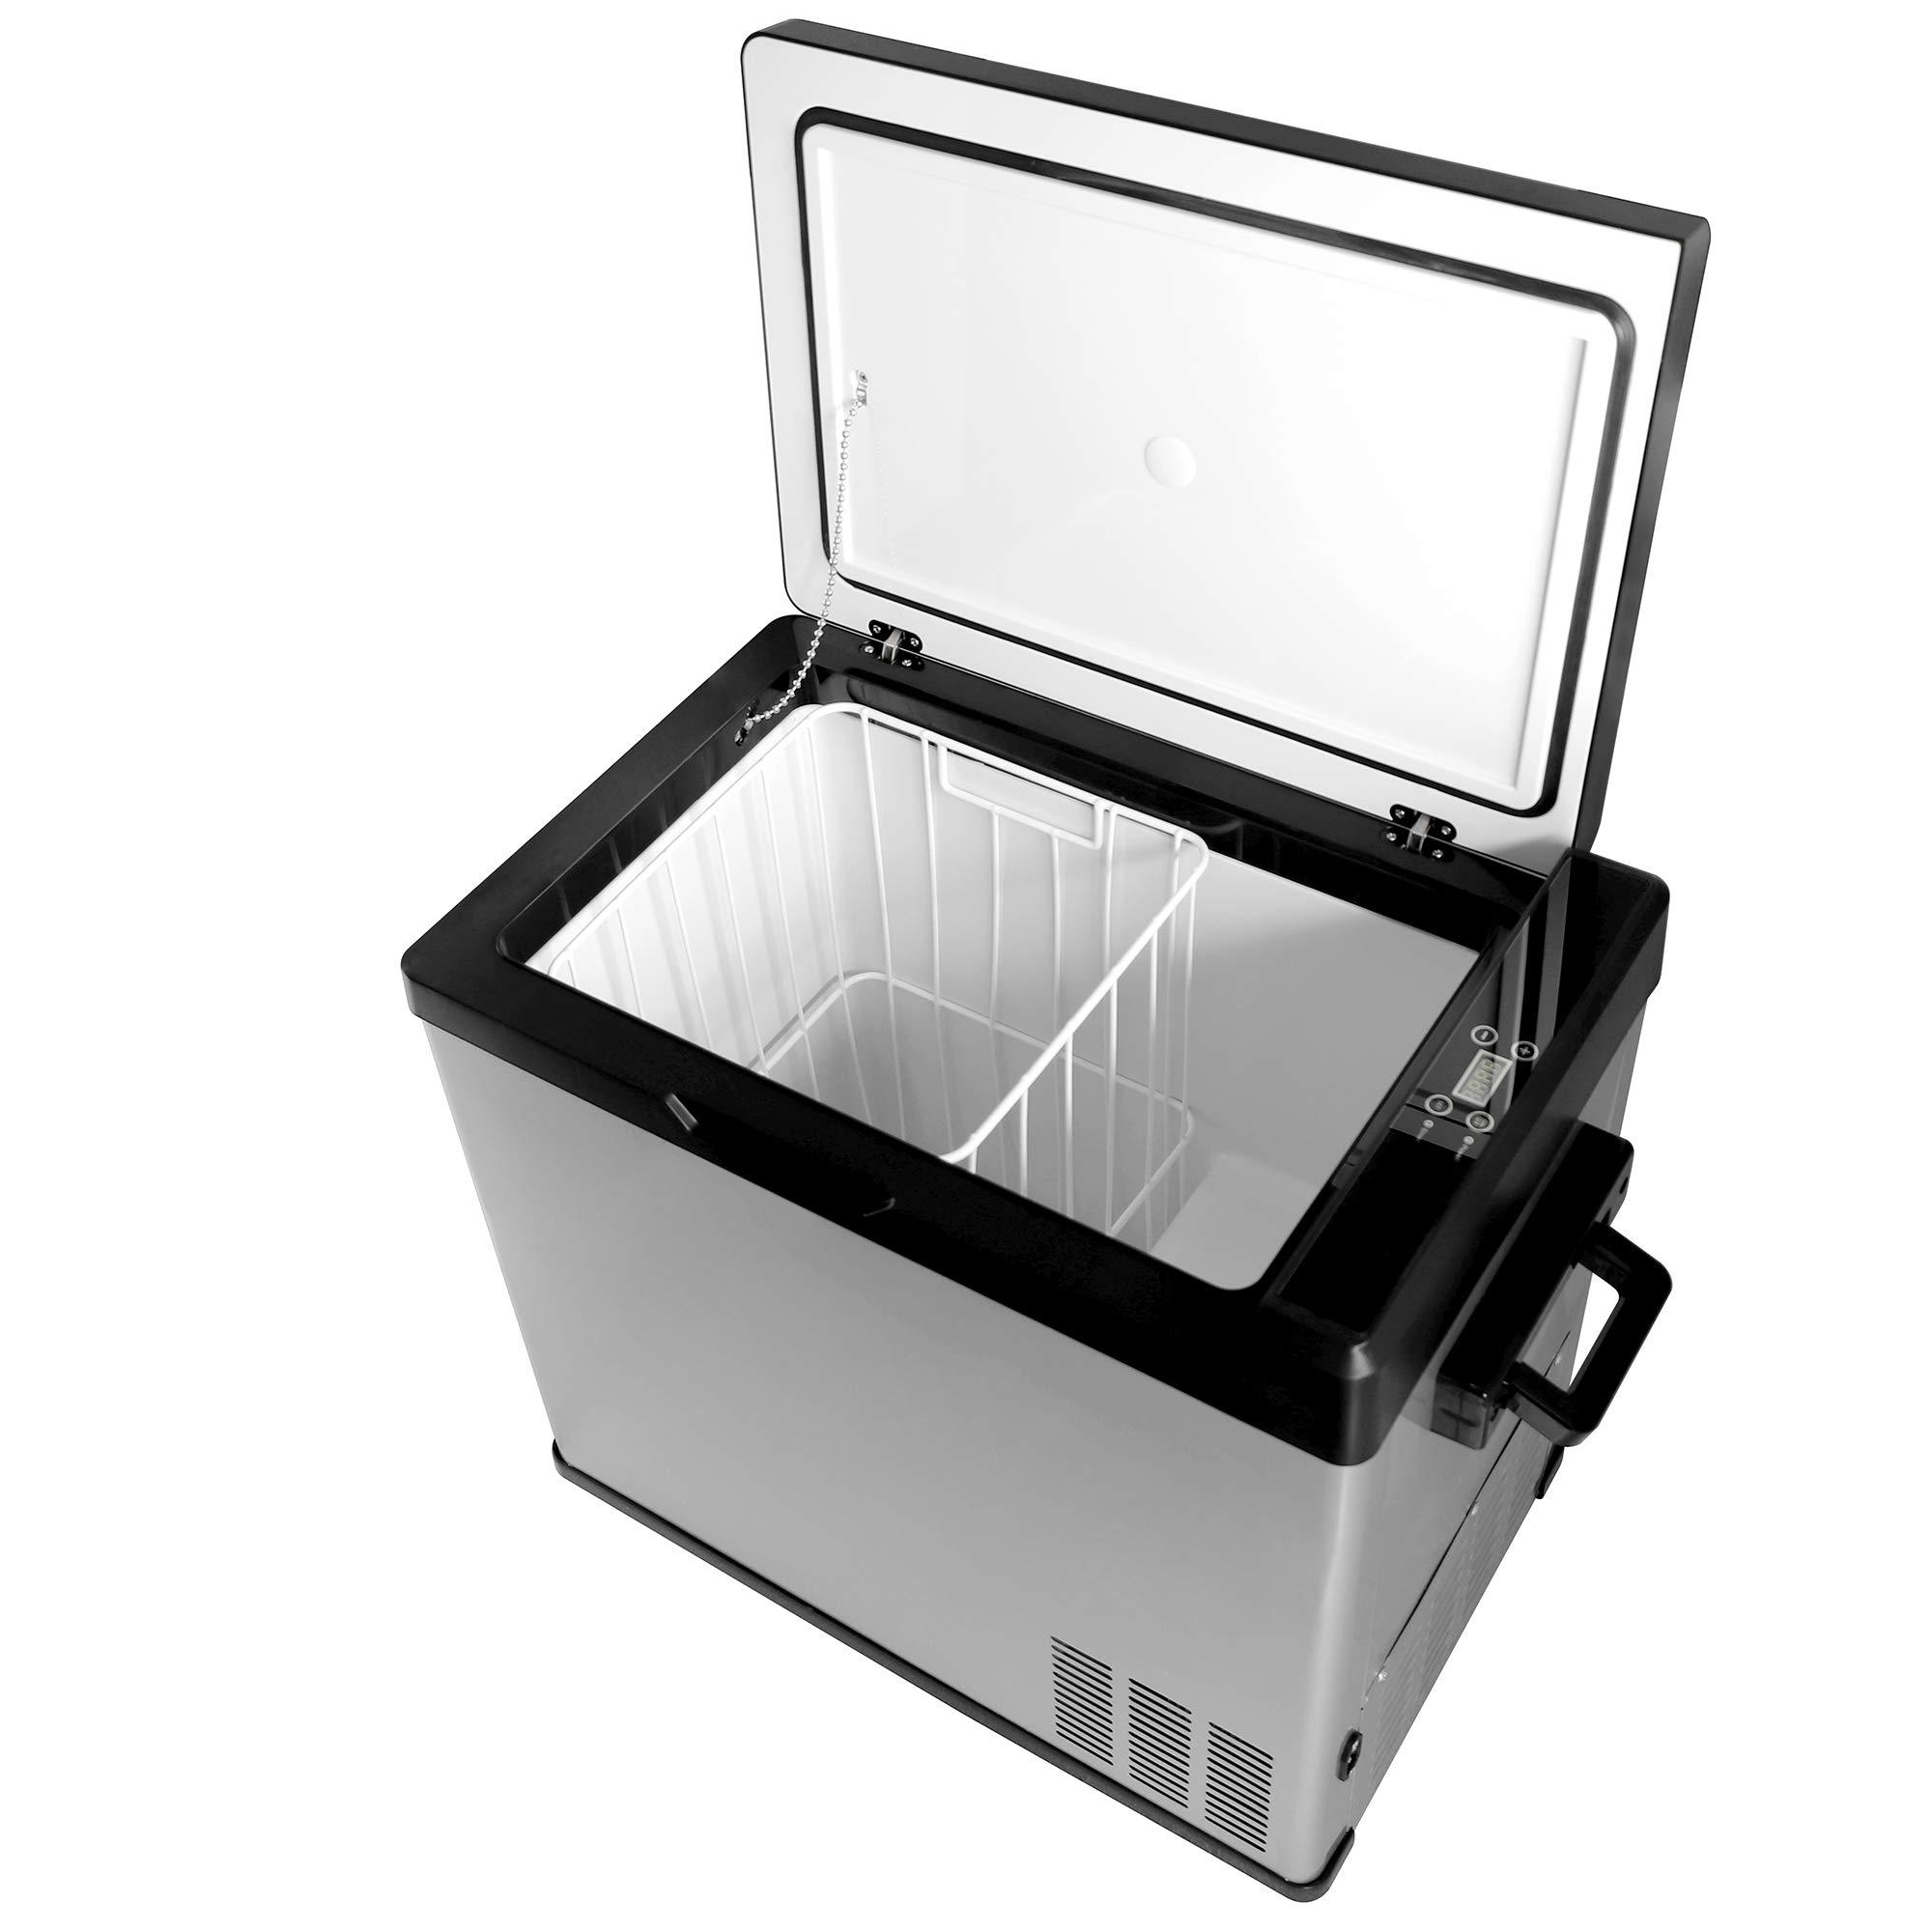 Northair Compact Car Refrigerator Portable Fridge Freezer with Temp Display,50 Liter/53 Quart,-13°F~68°F,DC12/24V AC110V Compressor Cooler for Car, Truck, RV,Boat,Camping,Road trip, Household